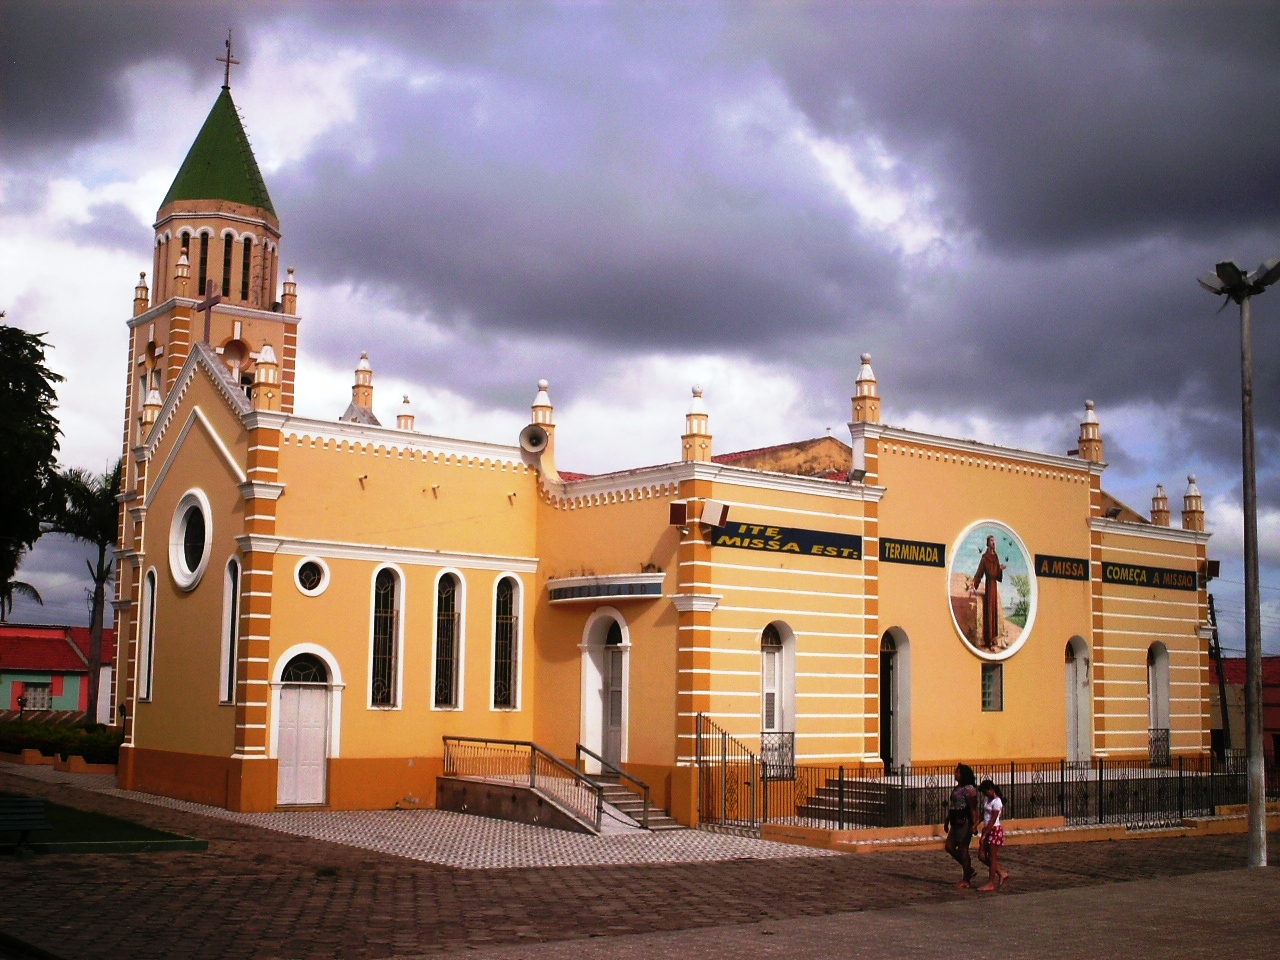 Cruz Ceará fonte: upload.wikimedia.org